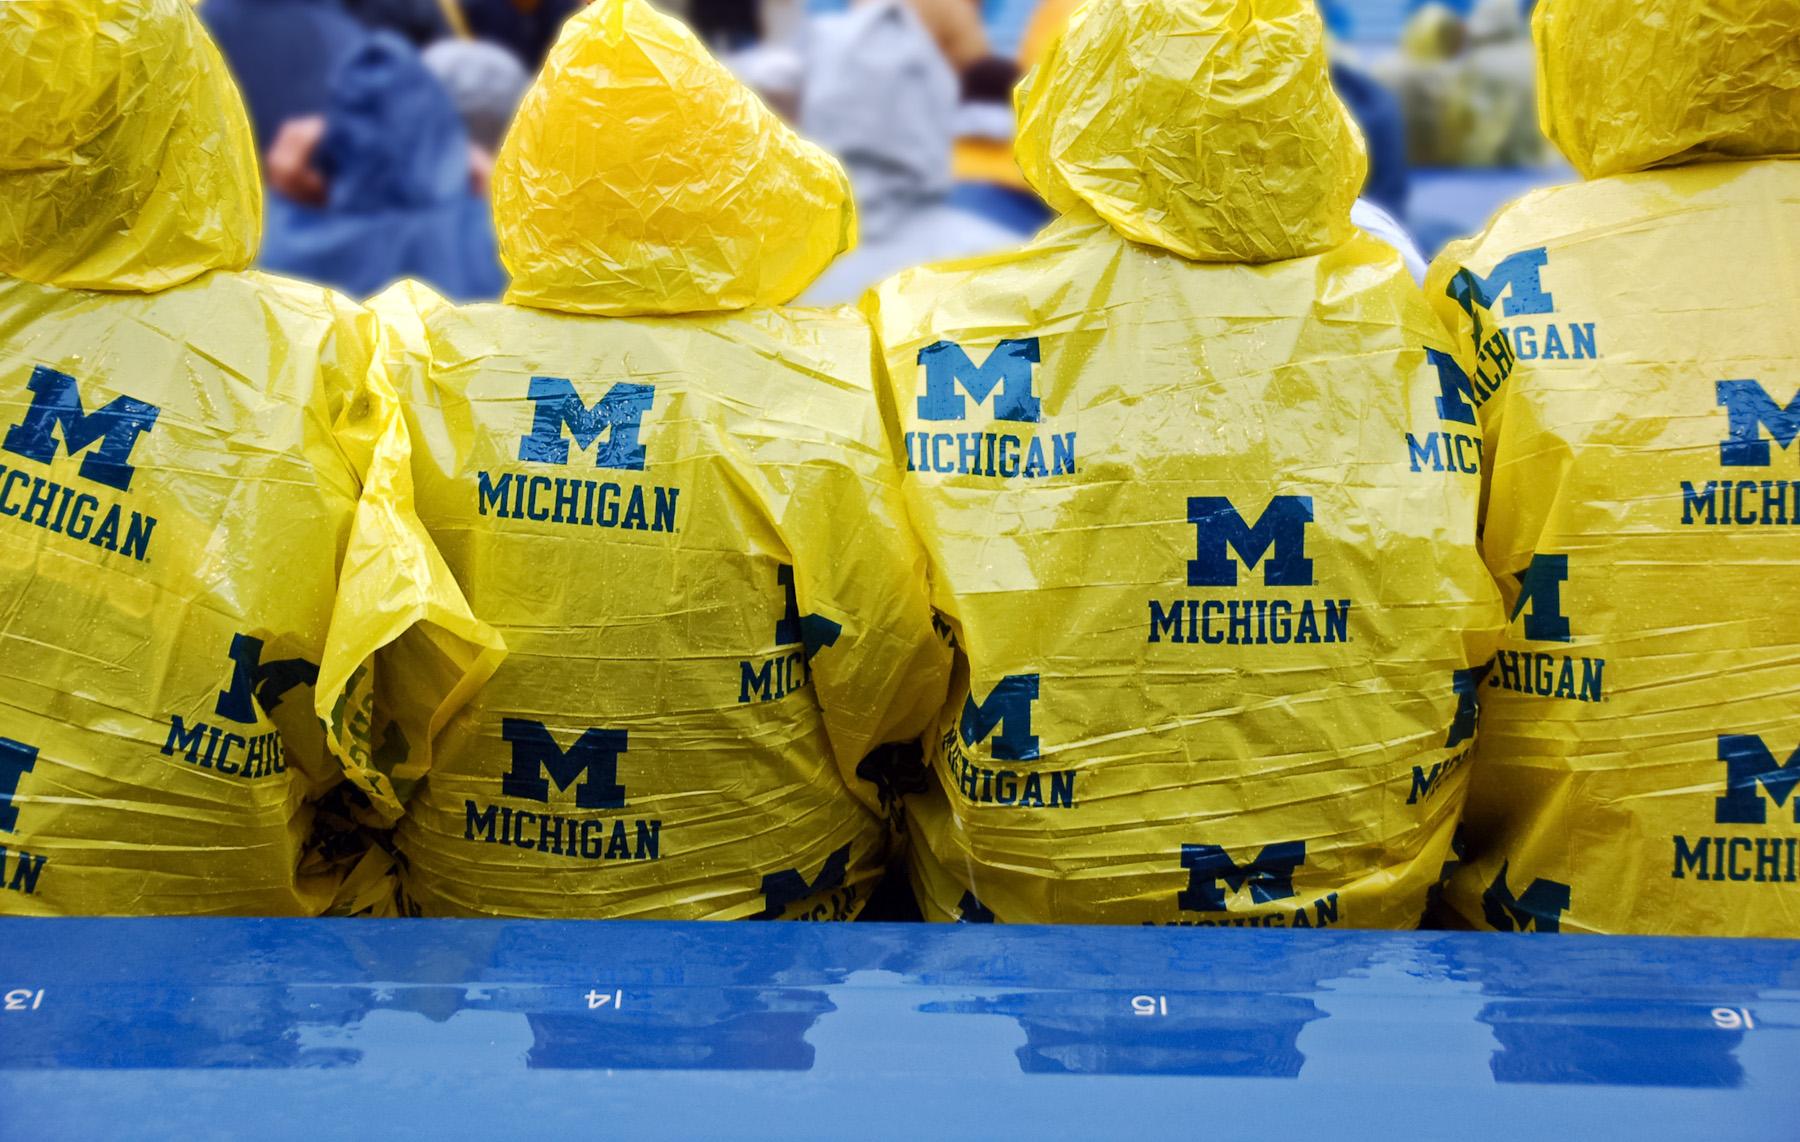 Michigan Football Photo.jpg